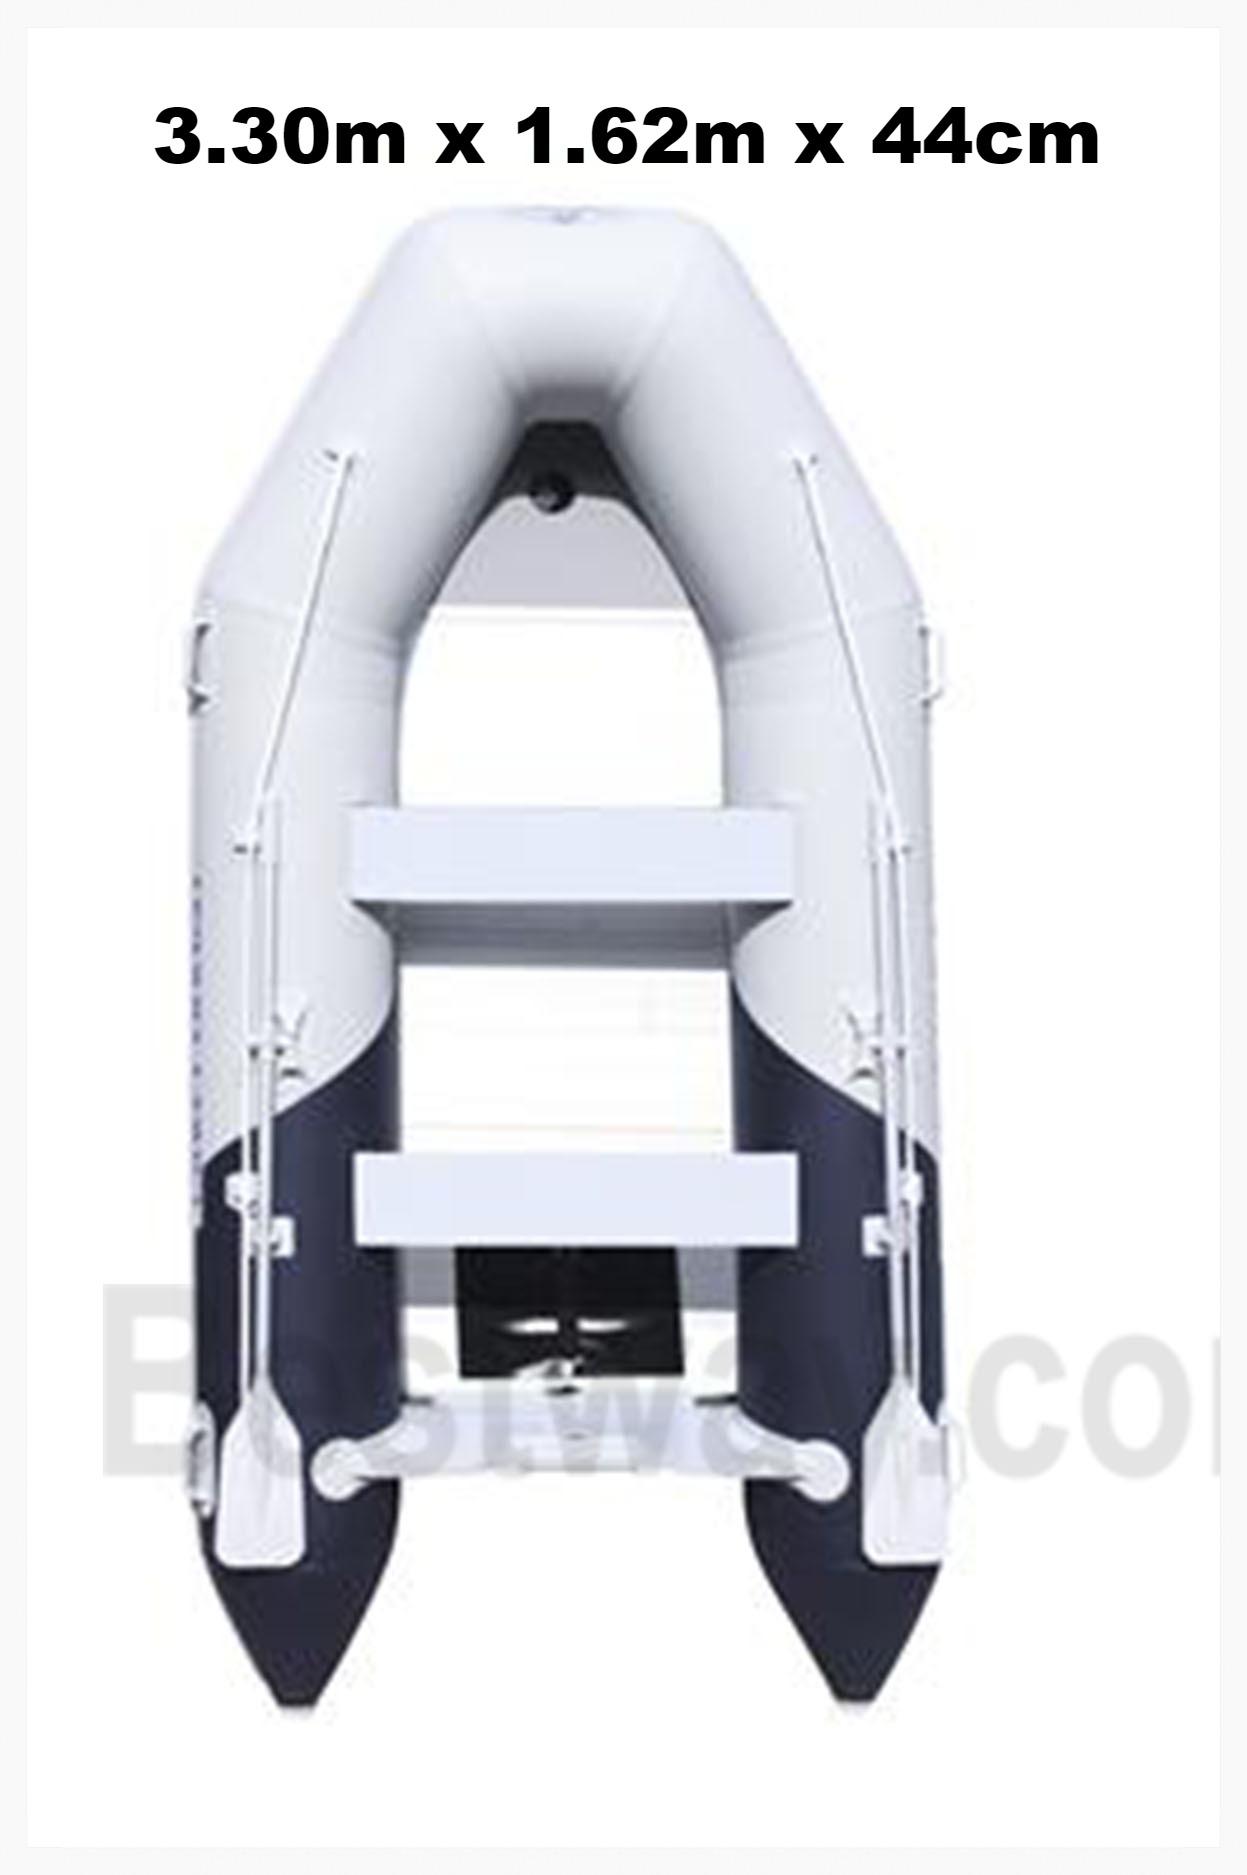 Thuyền bơm hơi Bestway 65049